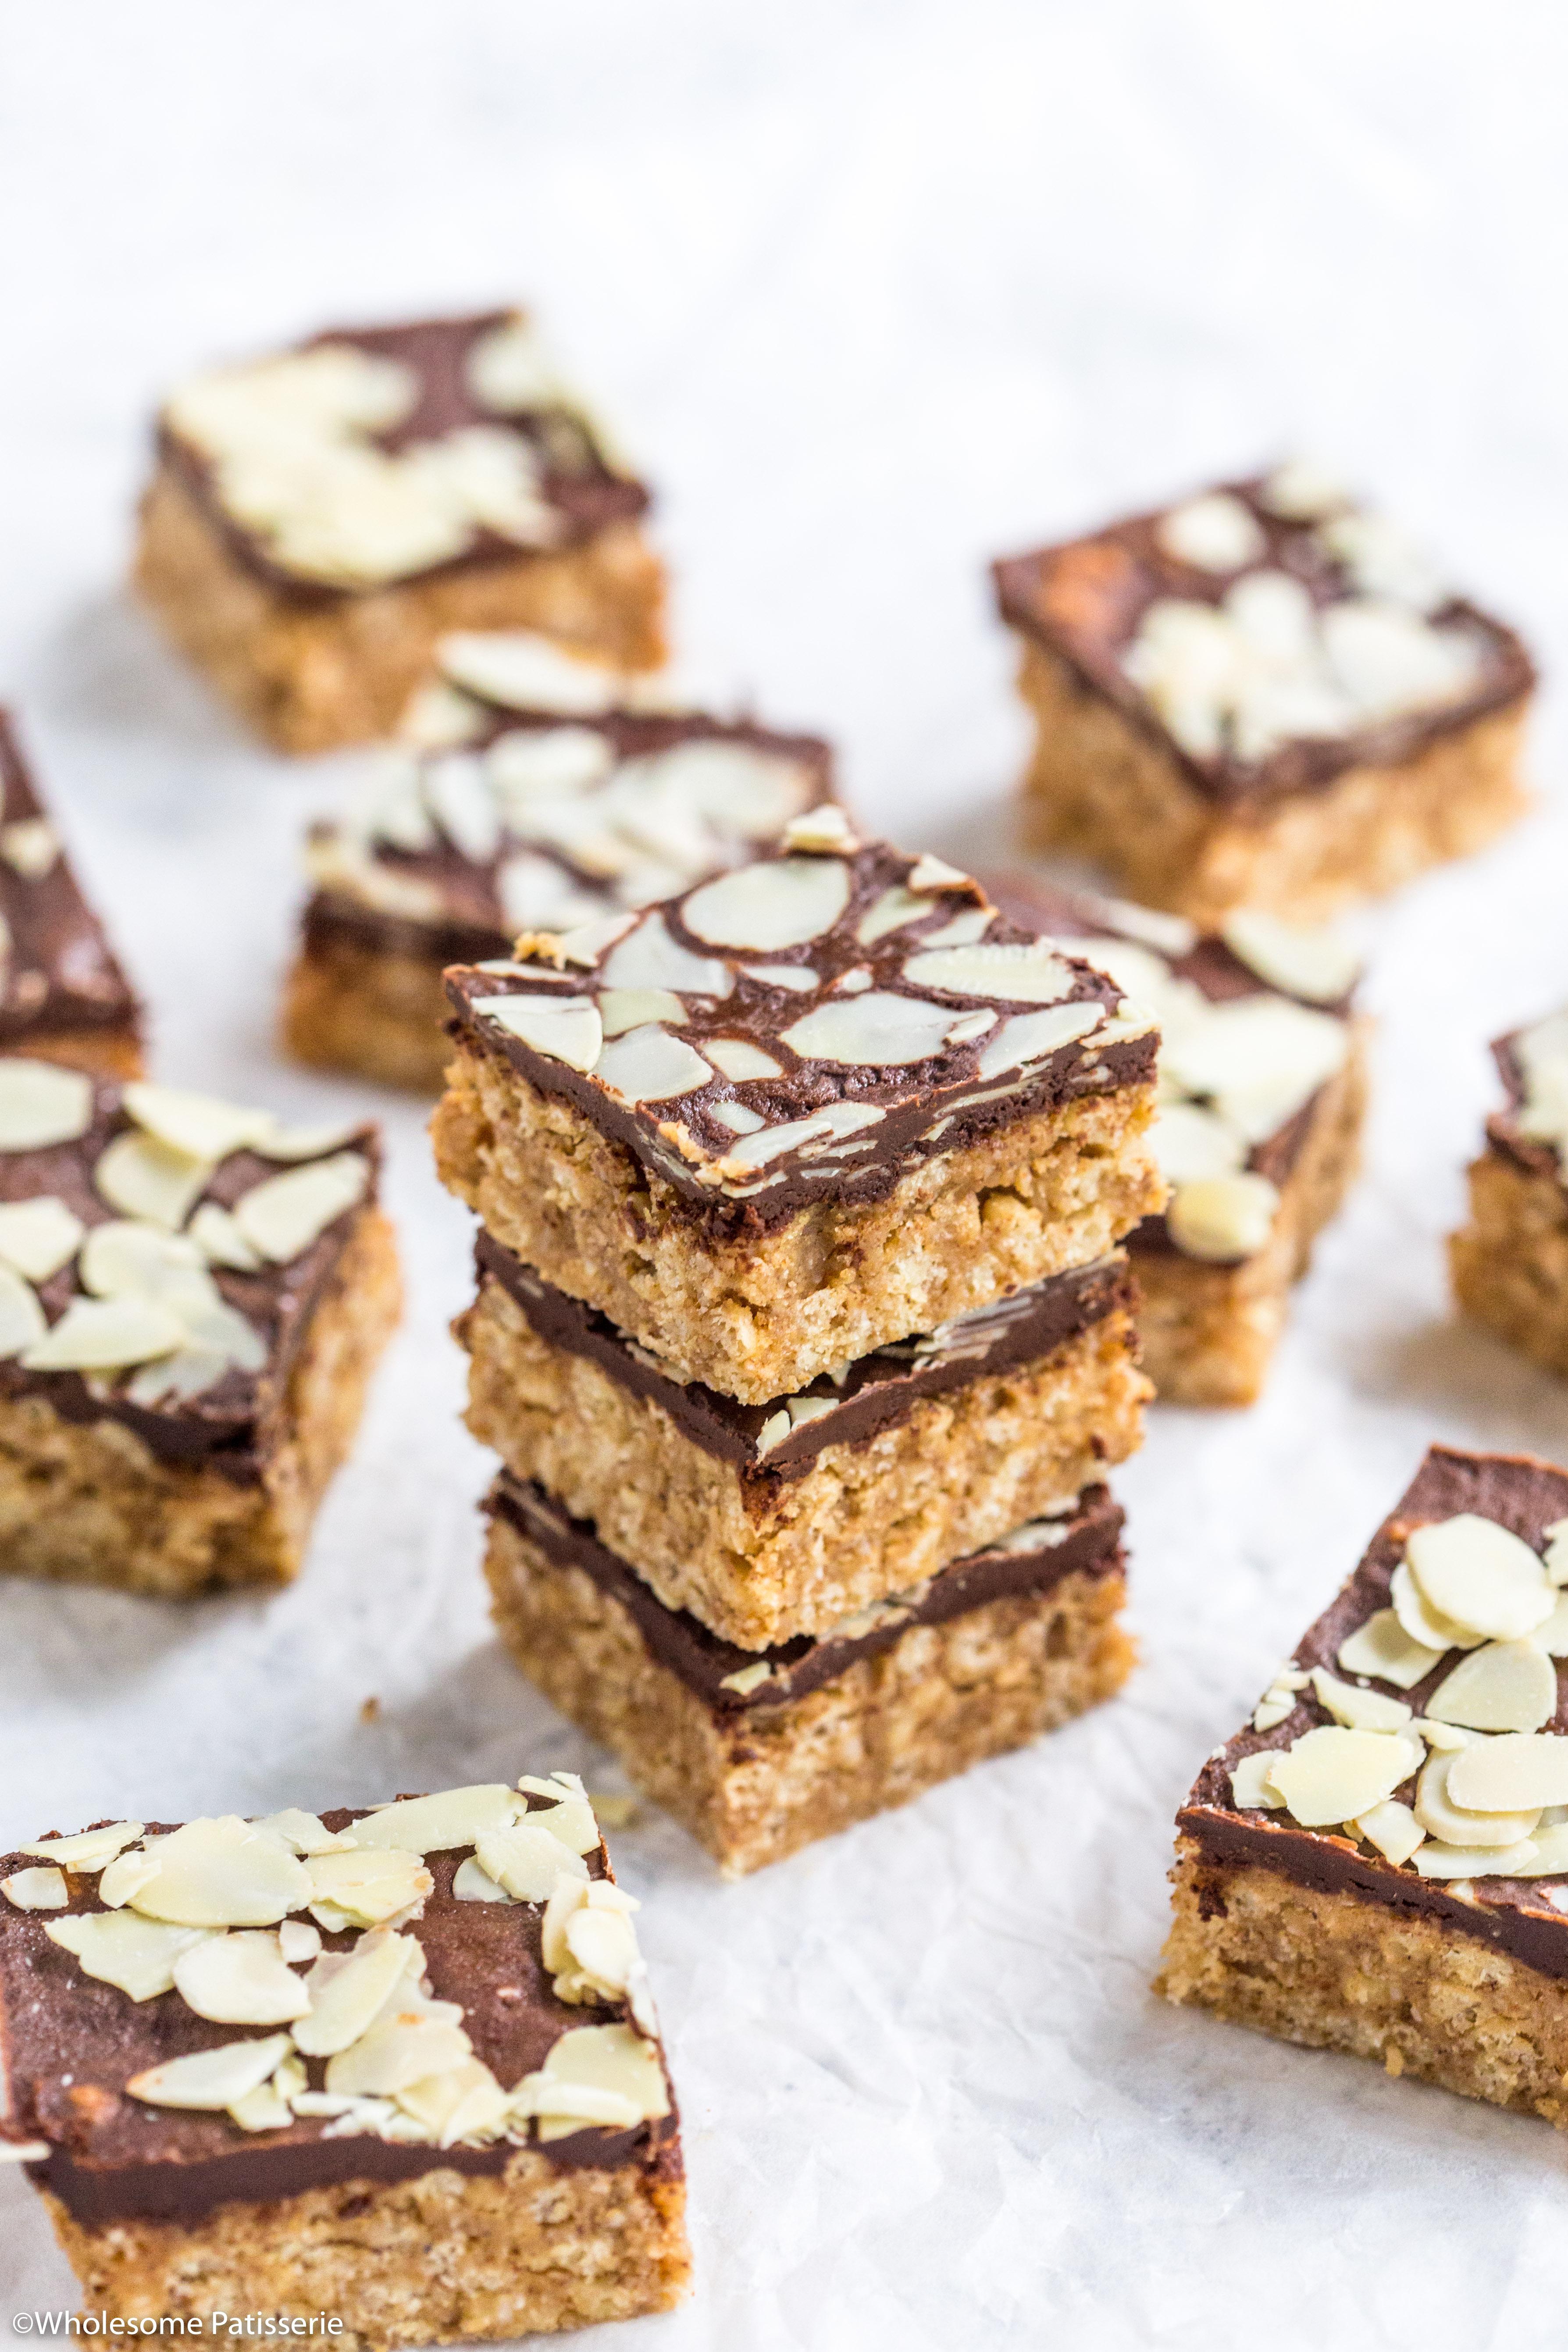 Almond-butter-crispy-chocolate-bars-gluten-free-vegan-no-bake-easy-delicious-4